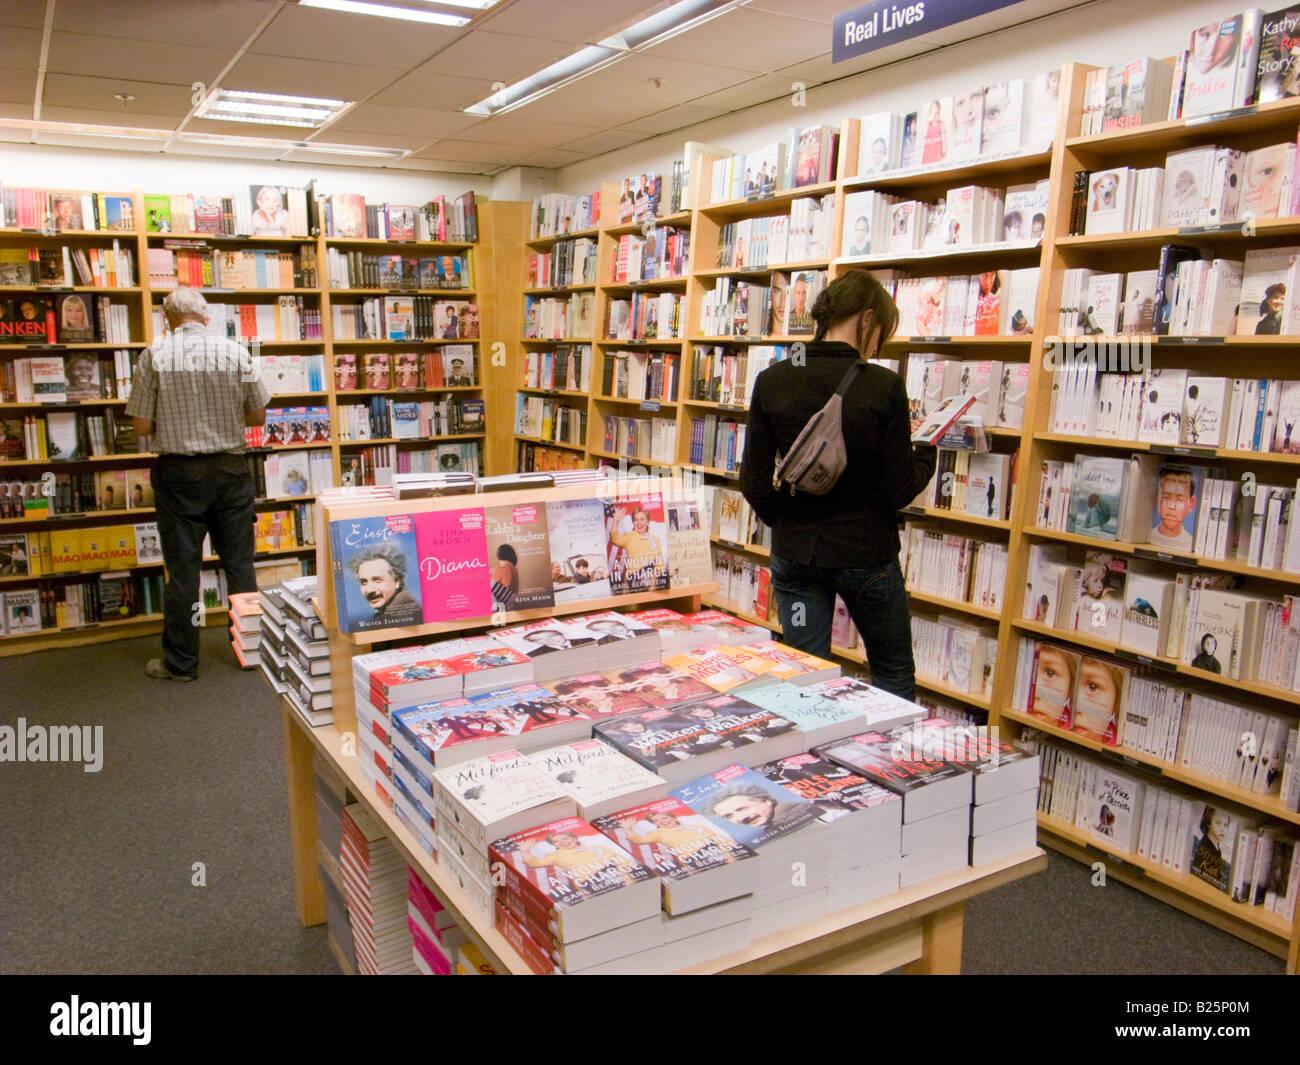 People browsing in Borders bookshop, London, England, UK - Stock Image